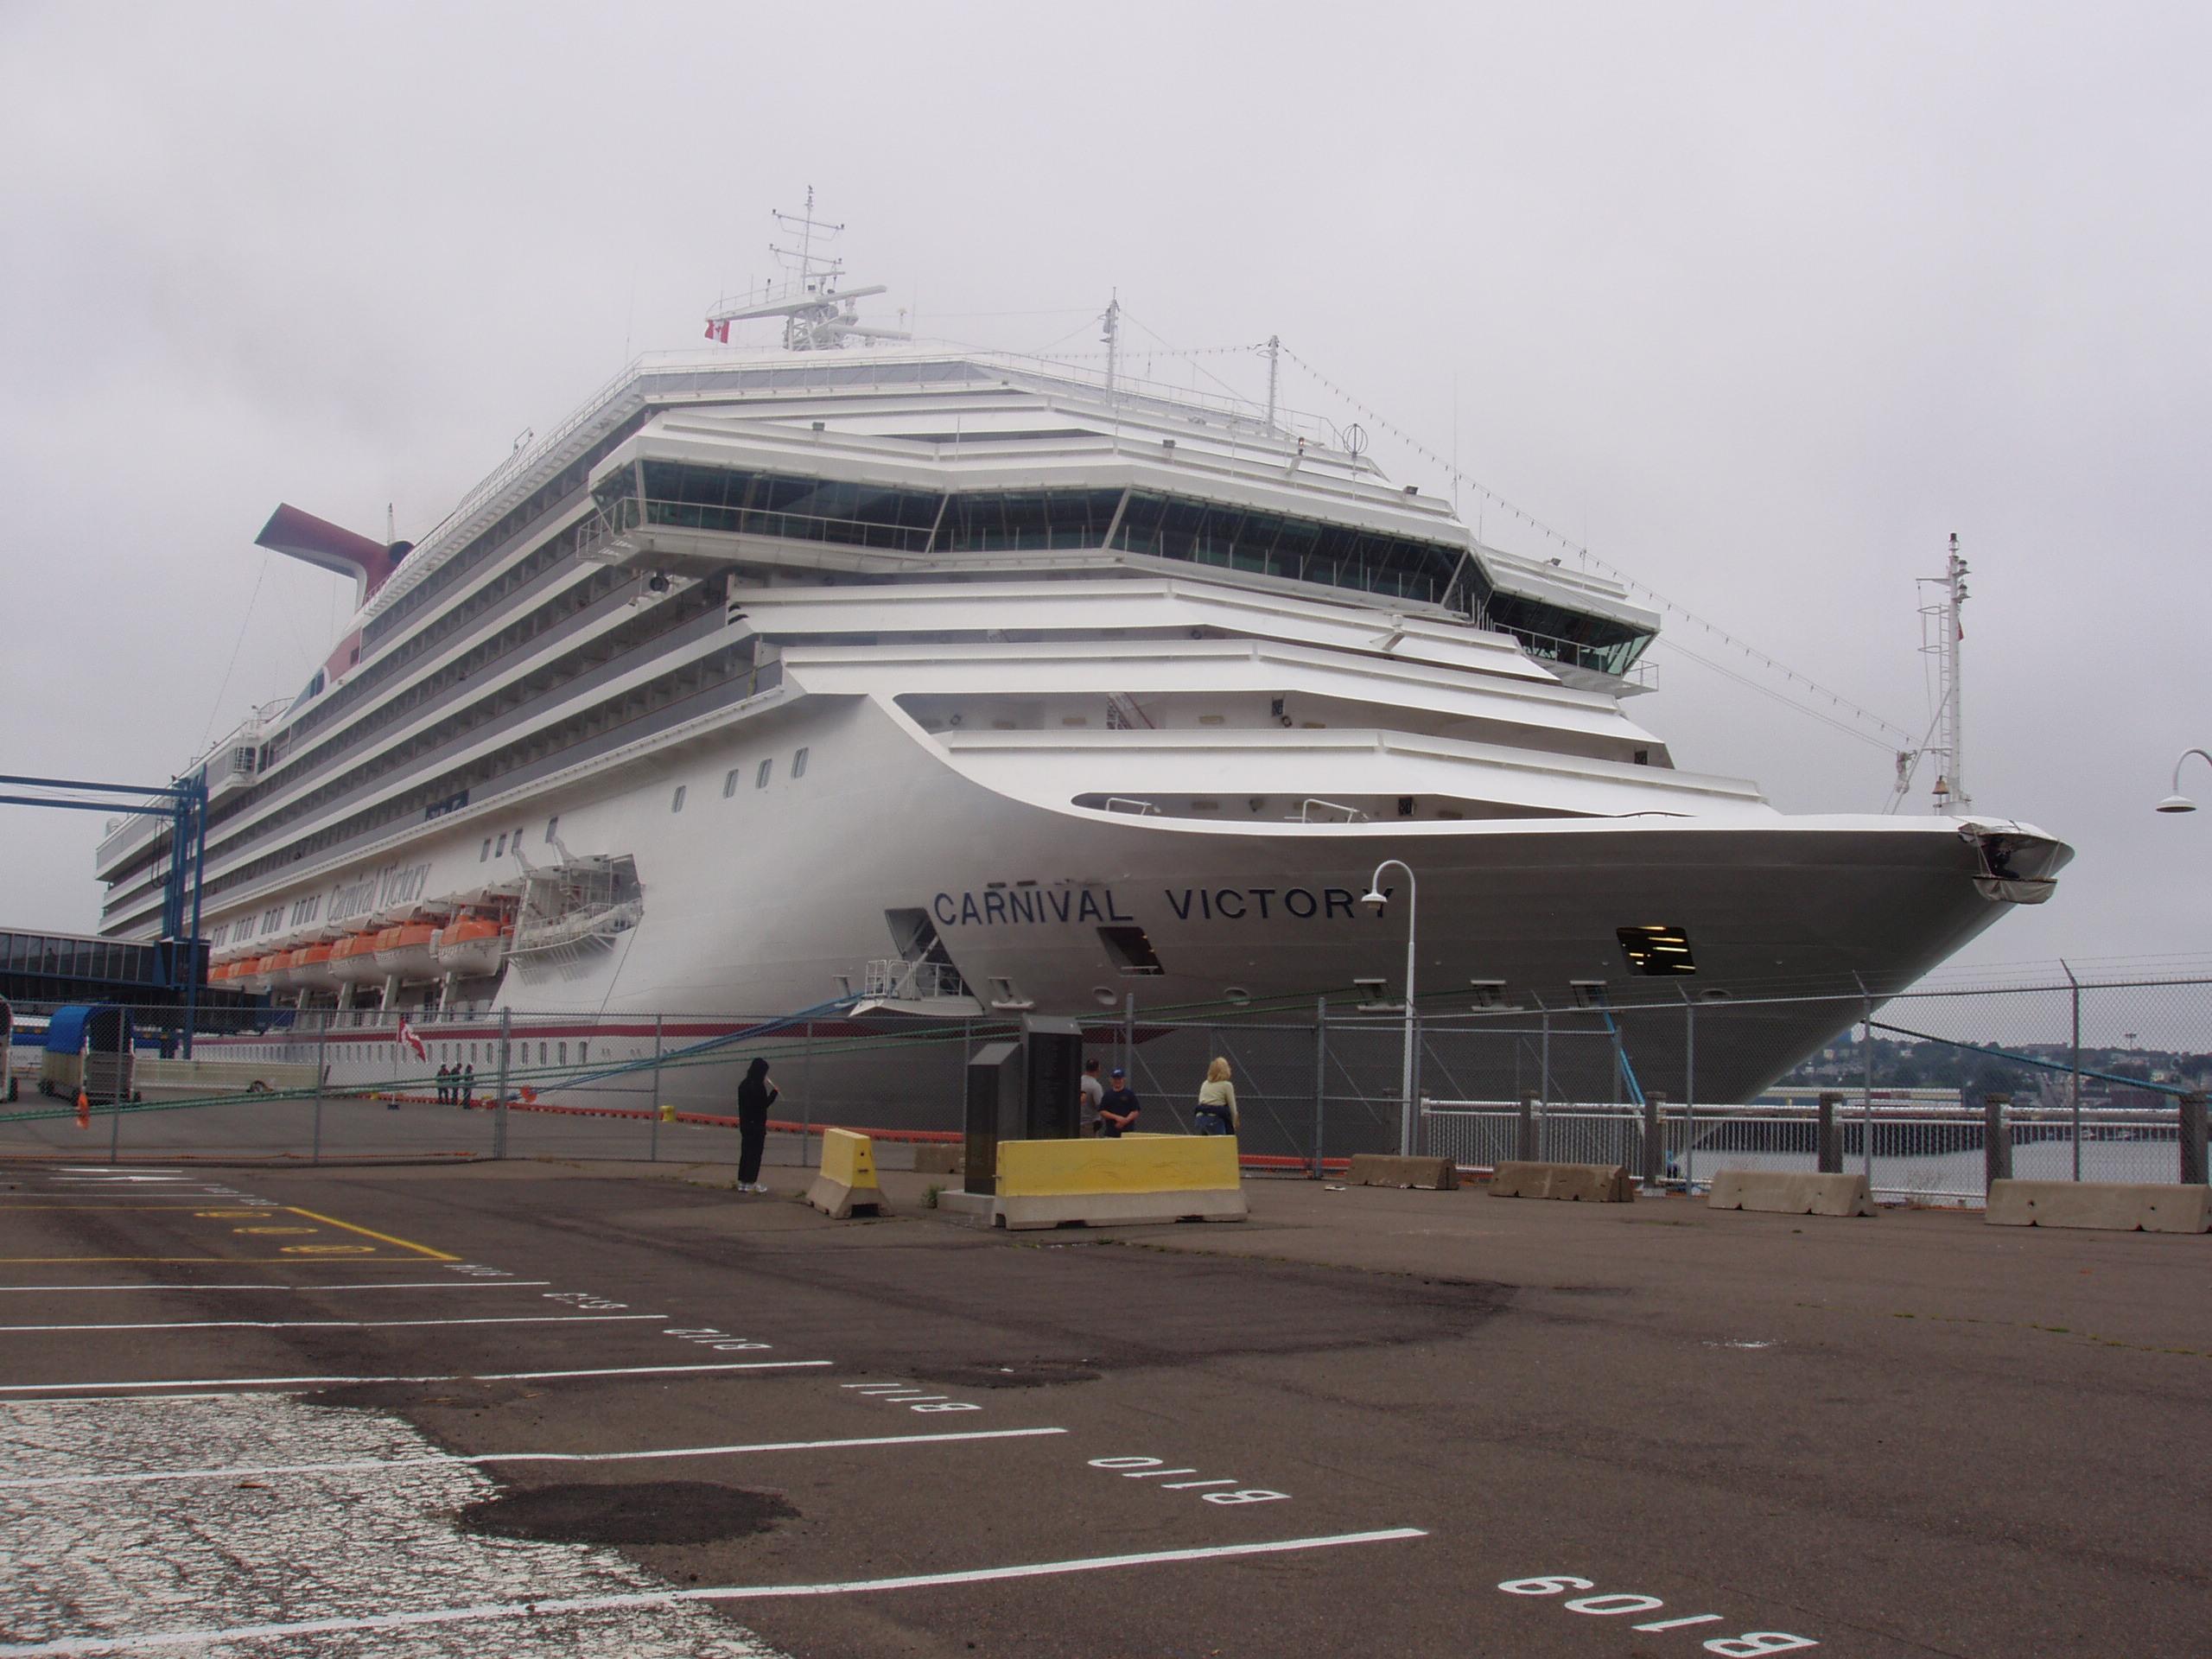 File:Carnival Cruise Ship.jpg - Wikimedia Commons